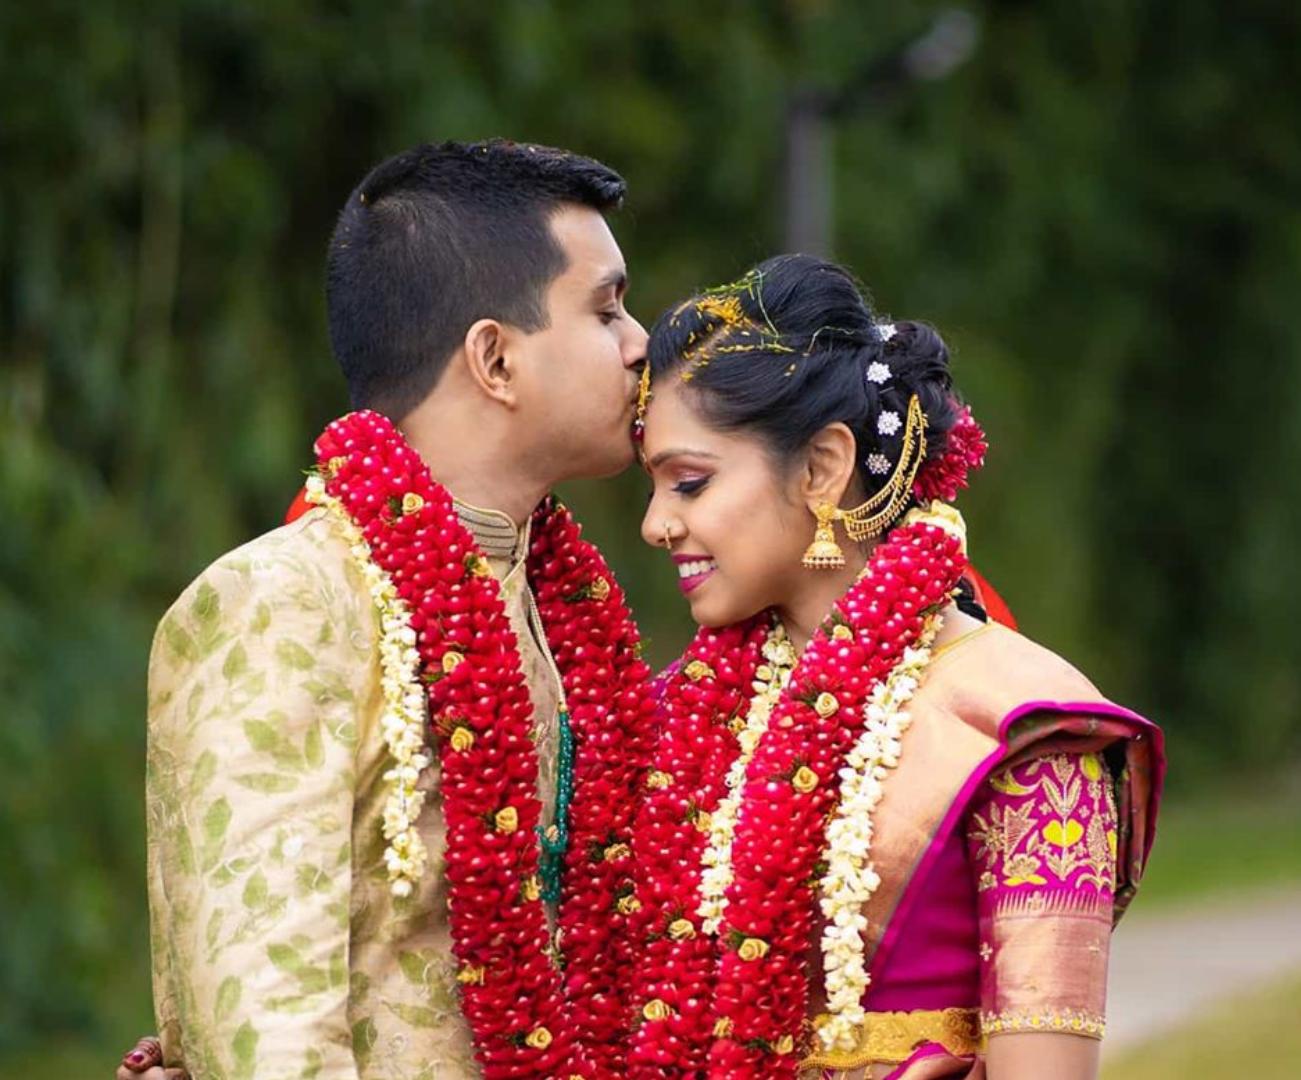 Bravura Brides_insta 2.PNG